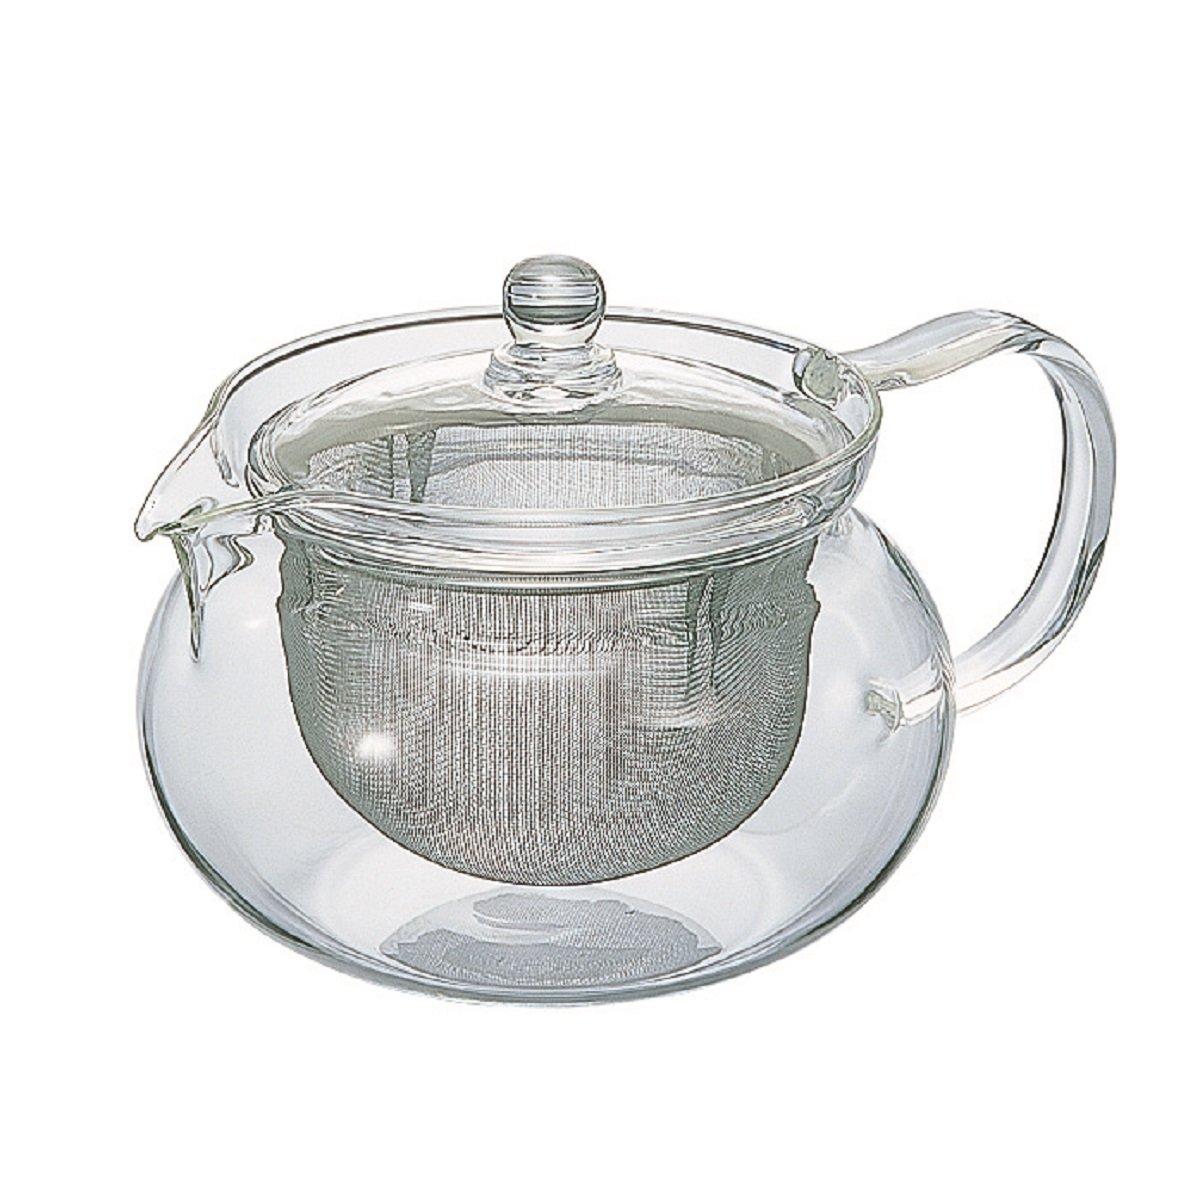 Hario Cha Cha Kyusu''Maru'' Tea Pot, 700ml